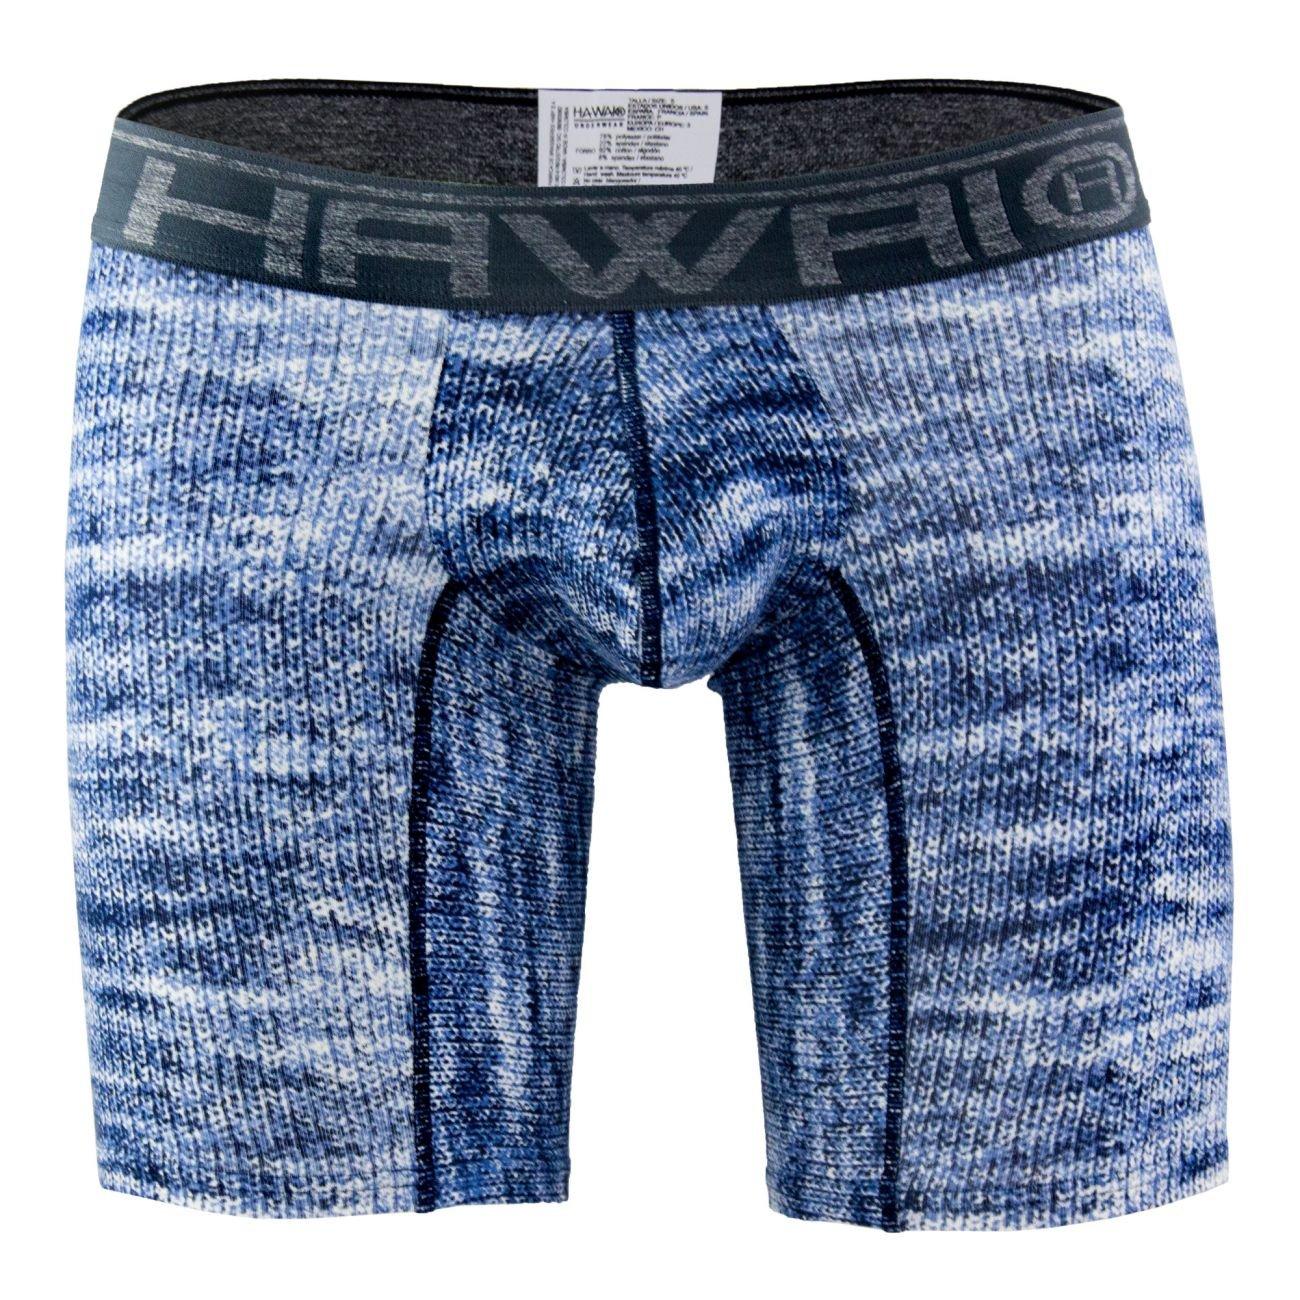 Hawai Boxer Briefs Trunks for Men